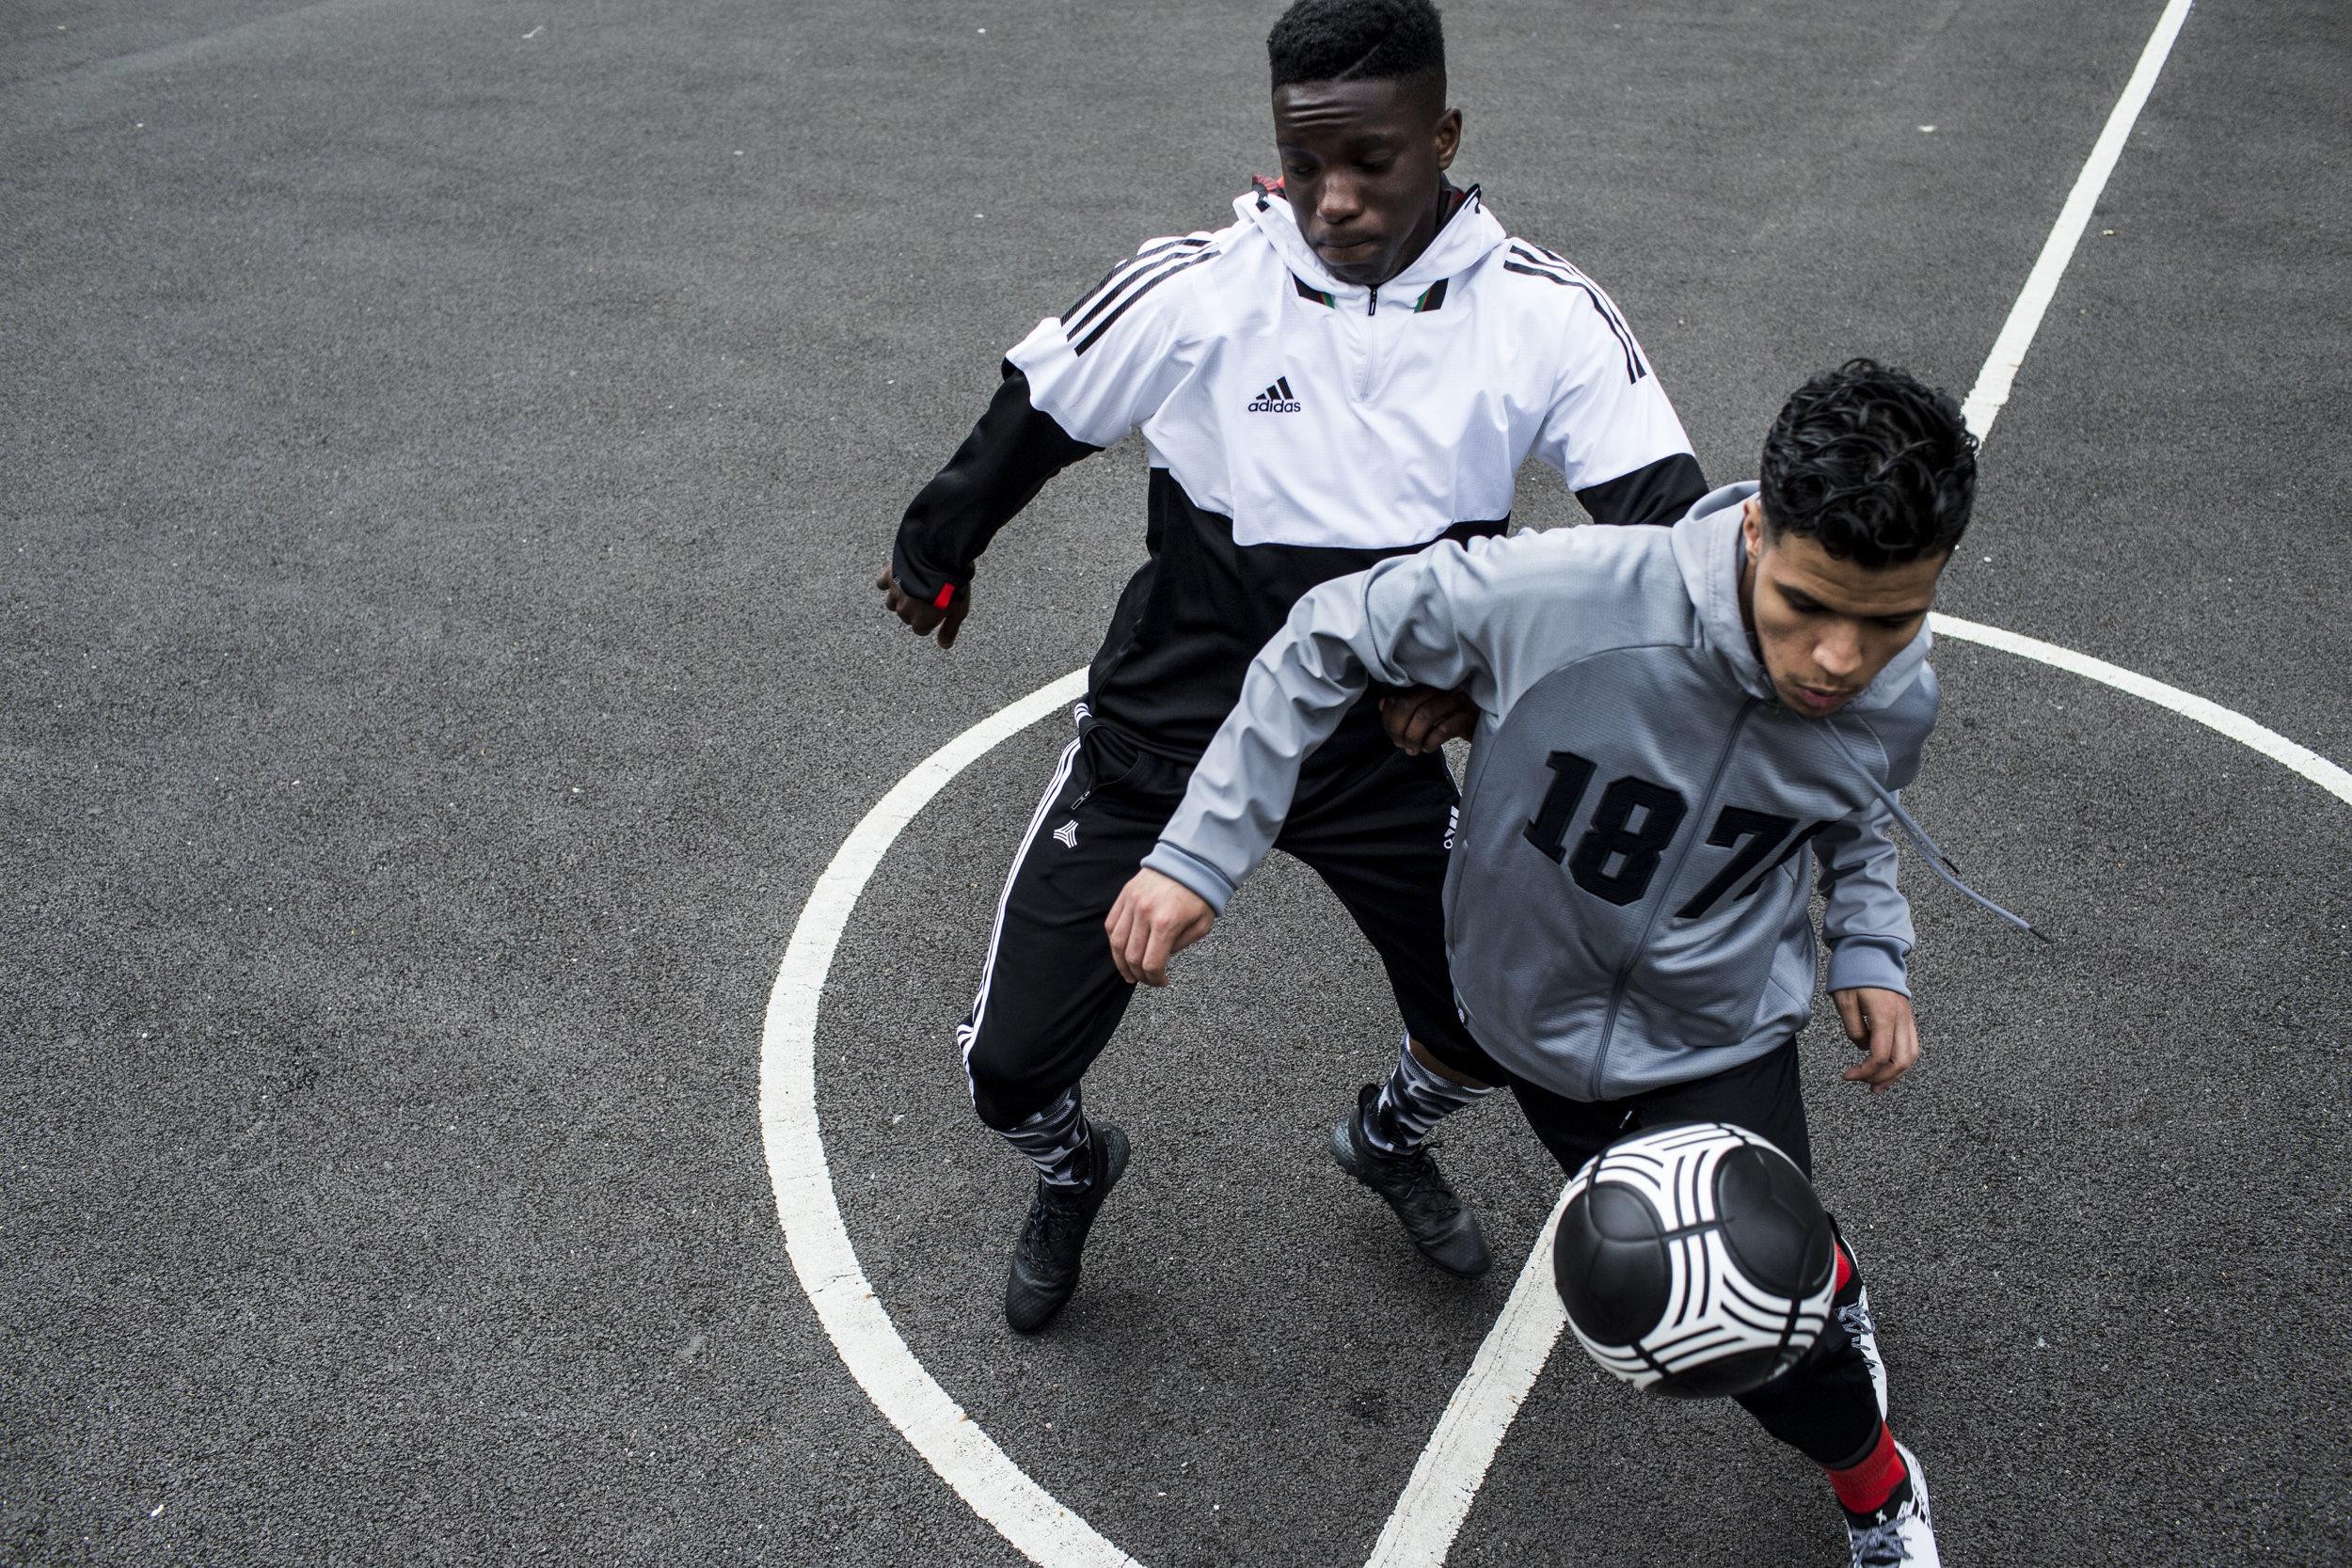 Adidas_Street_Football_Shot_03_Action_0067.jpg